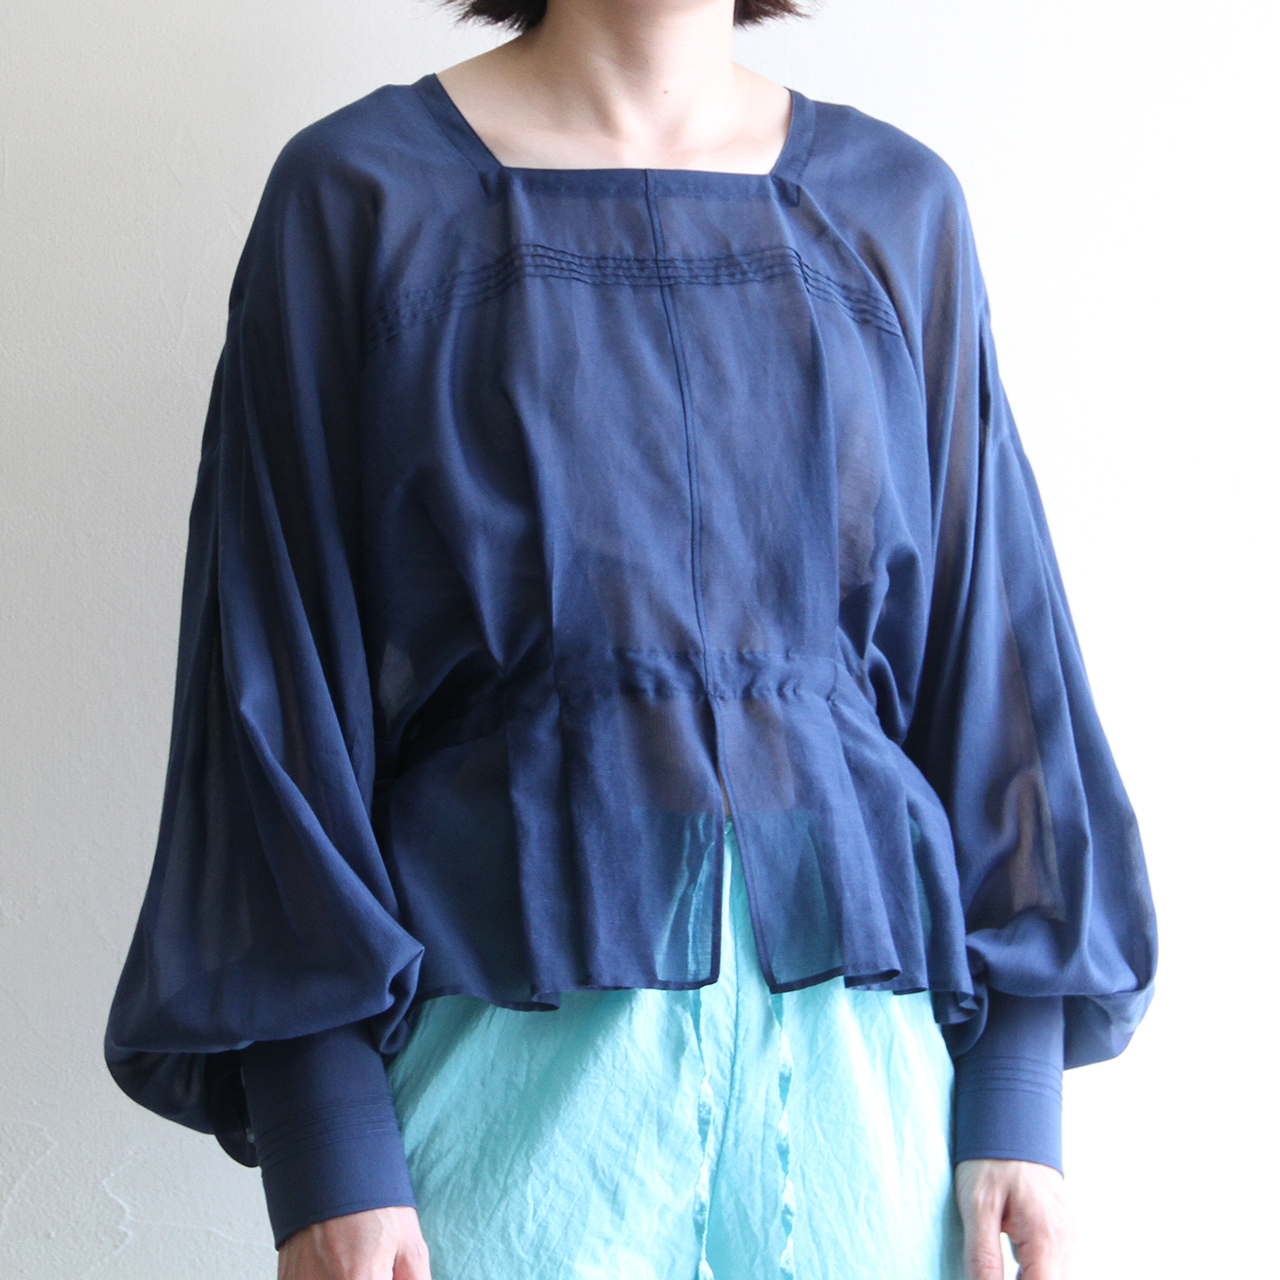 JUN MIKAMI 【 womens 】silk cotton square neck blouse